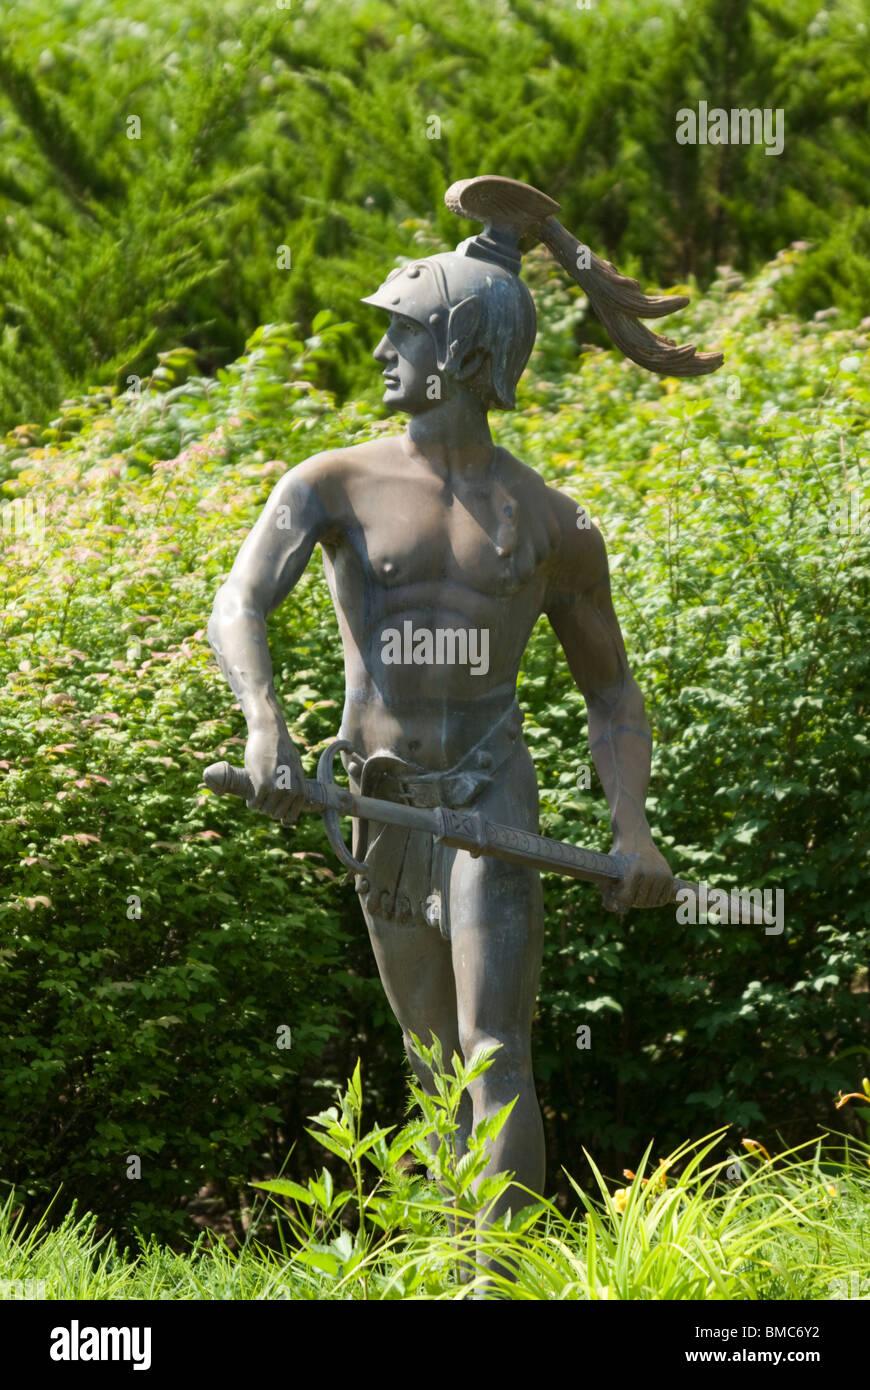 Statues at Barber Motorsports Park, Birmingham, Alabama, USA - Stock Image